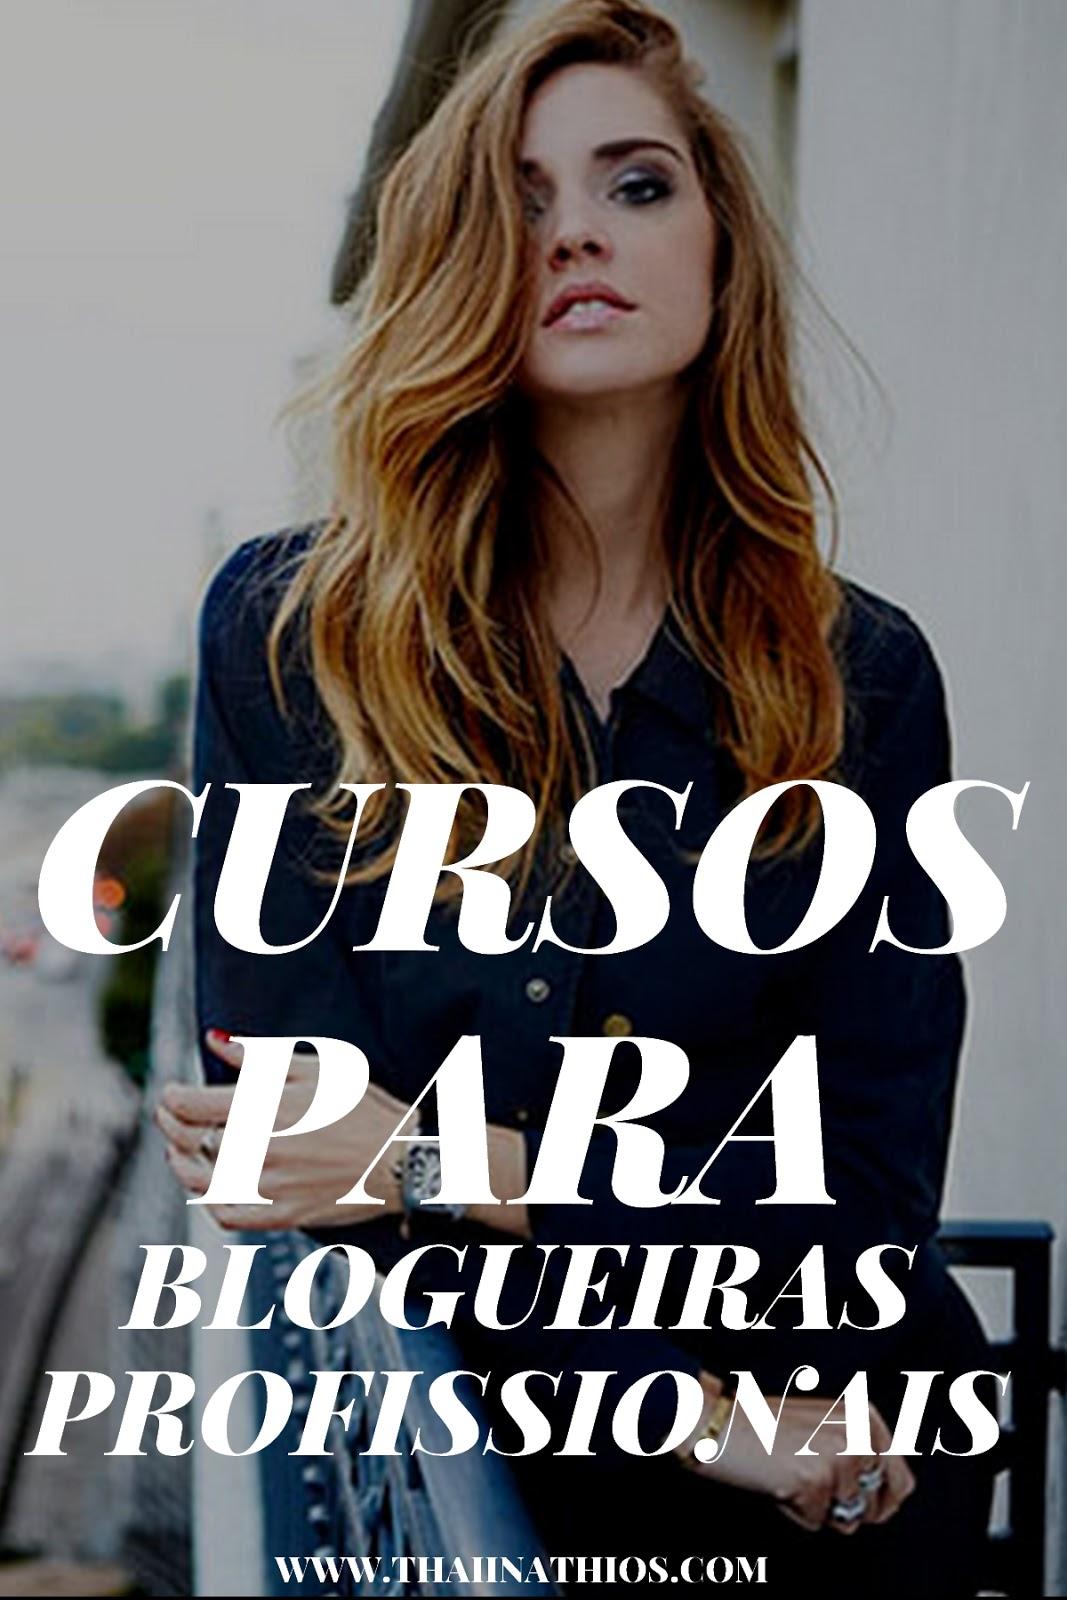 Cursos para Blogueiras Profissionais